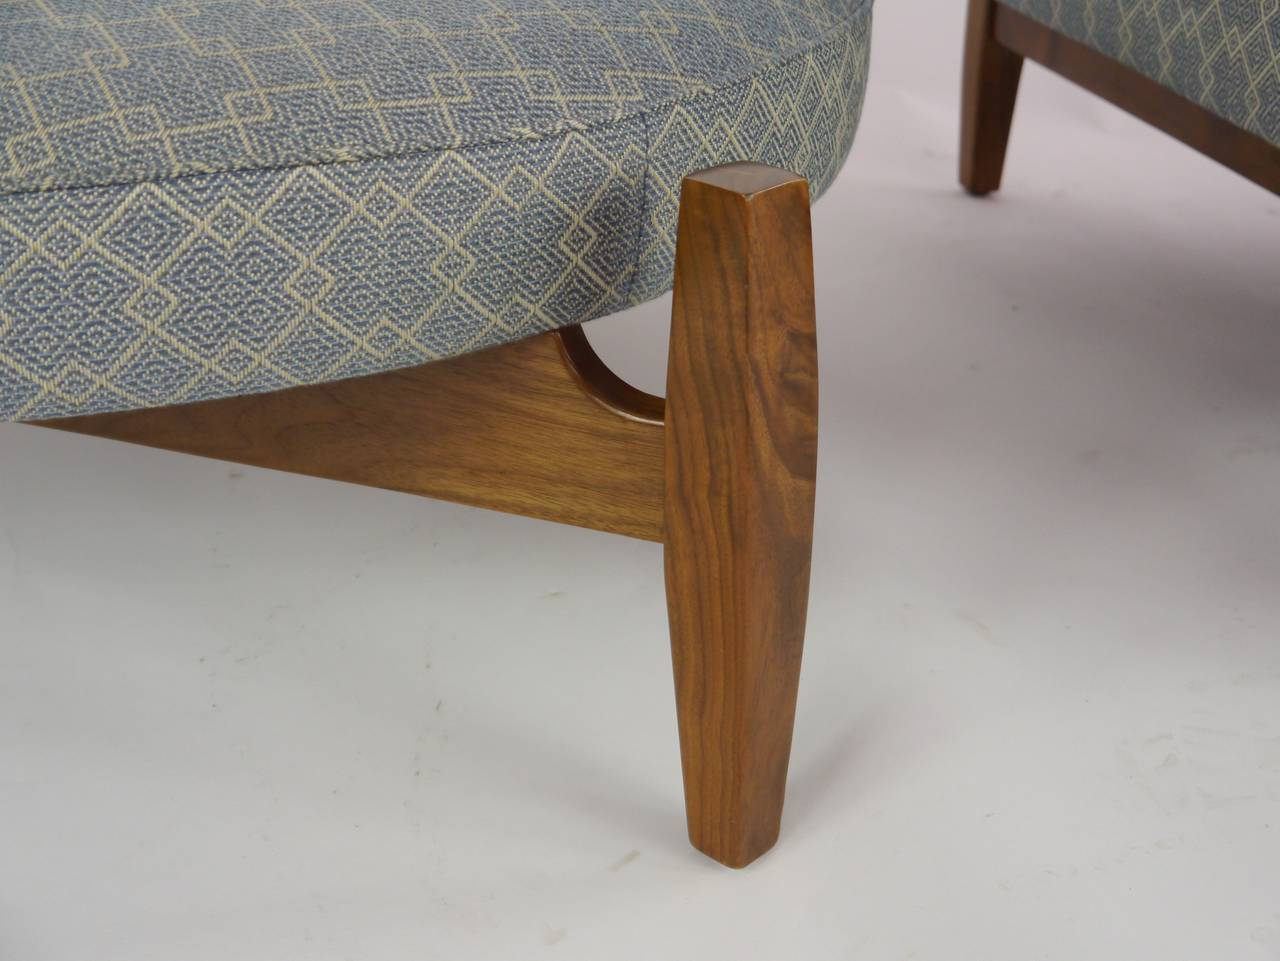 big chair with ottoman handicap bath rare jens risom quotbig quot at 1stdibs